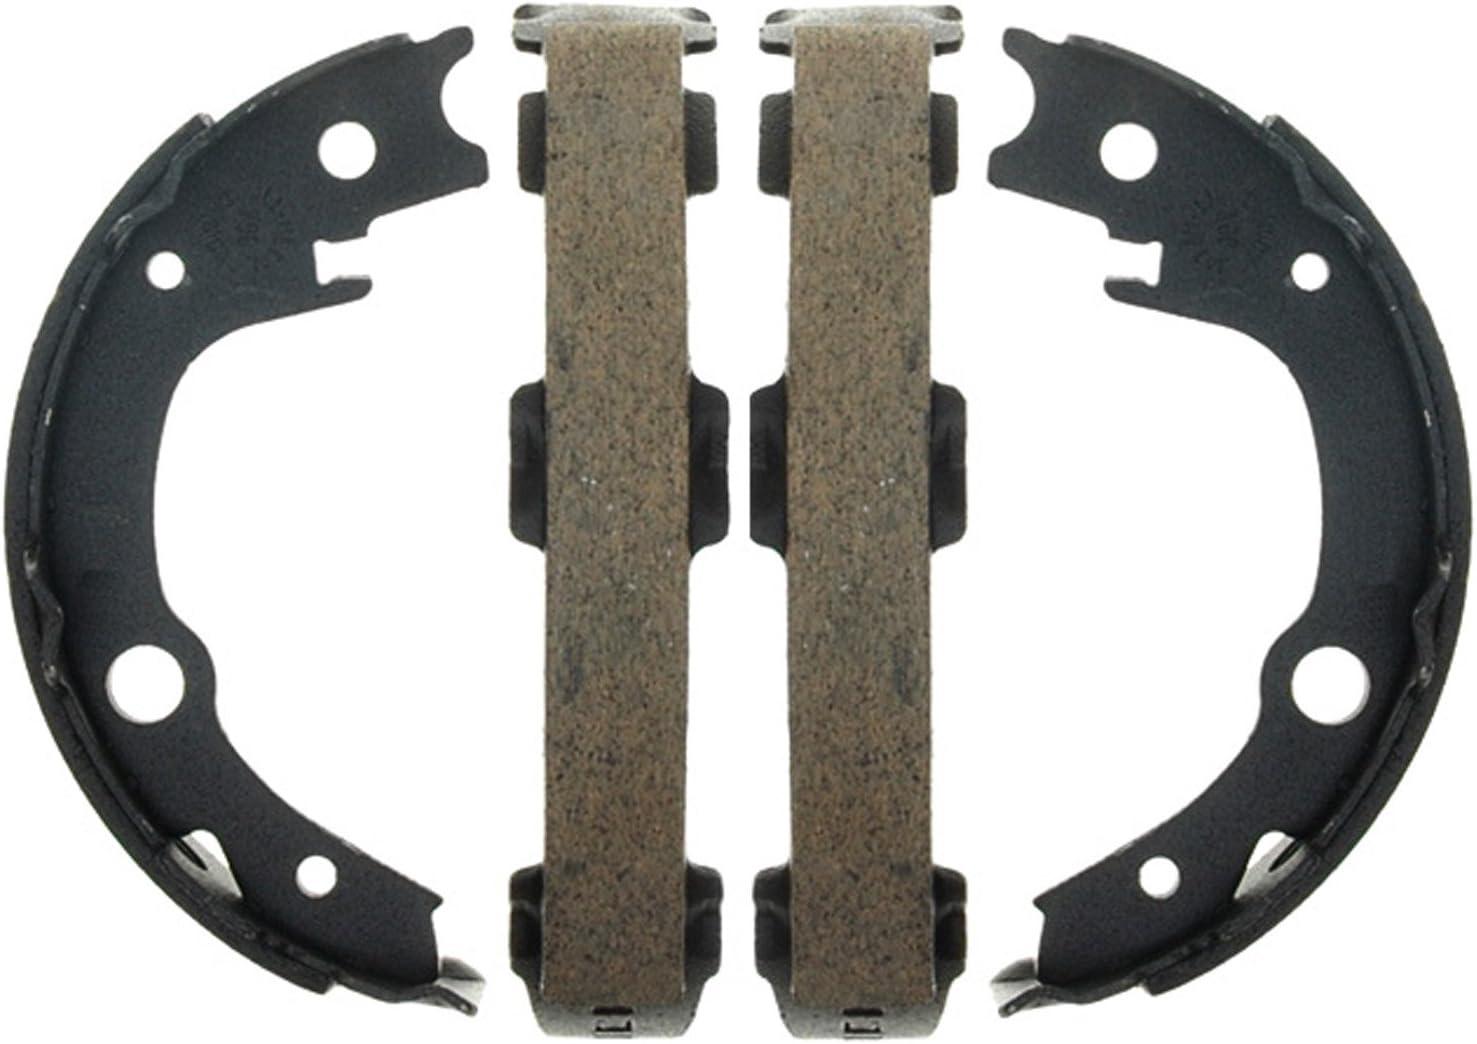 ACDelco 17932B Professional Bonded Rear Parking Brake Shoe Set